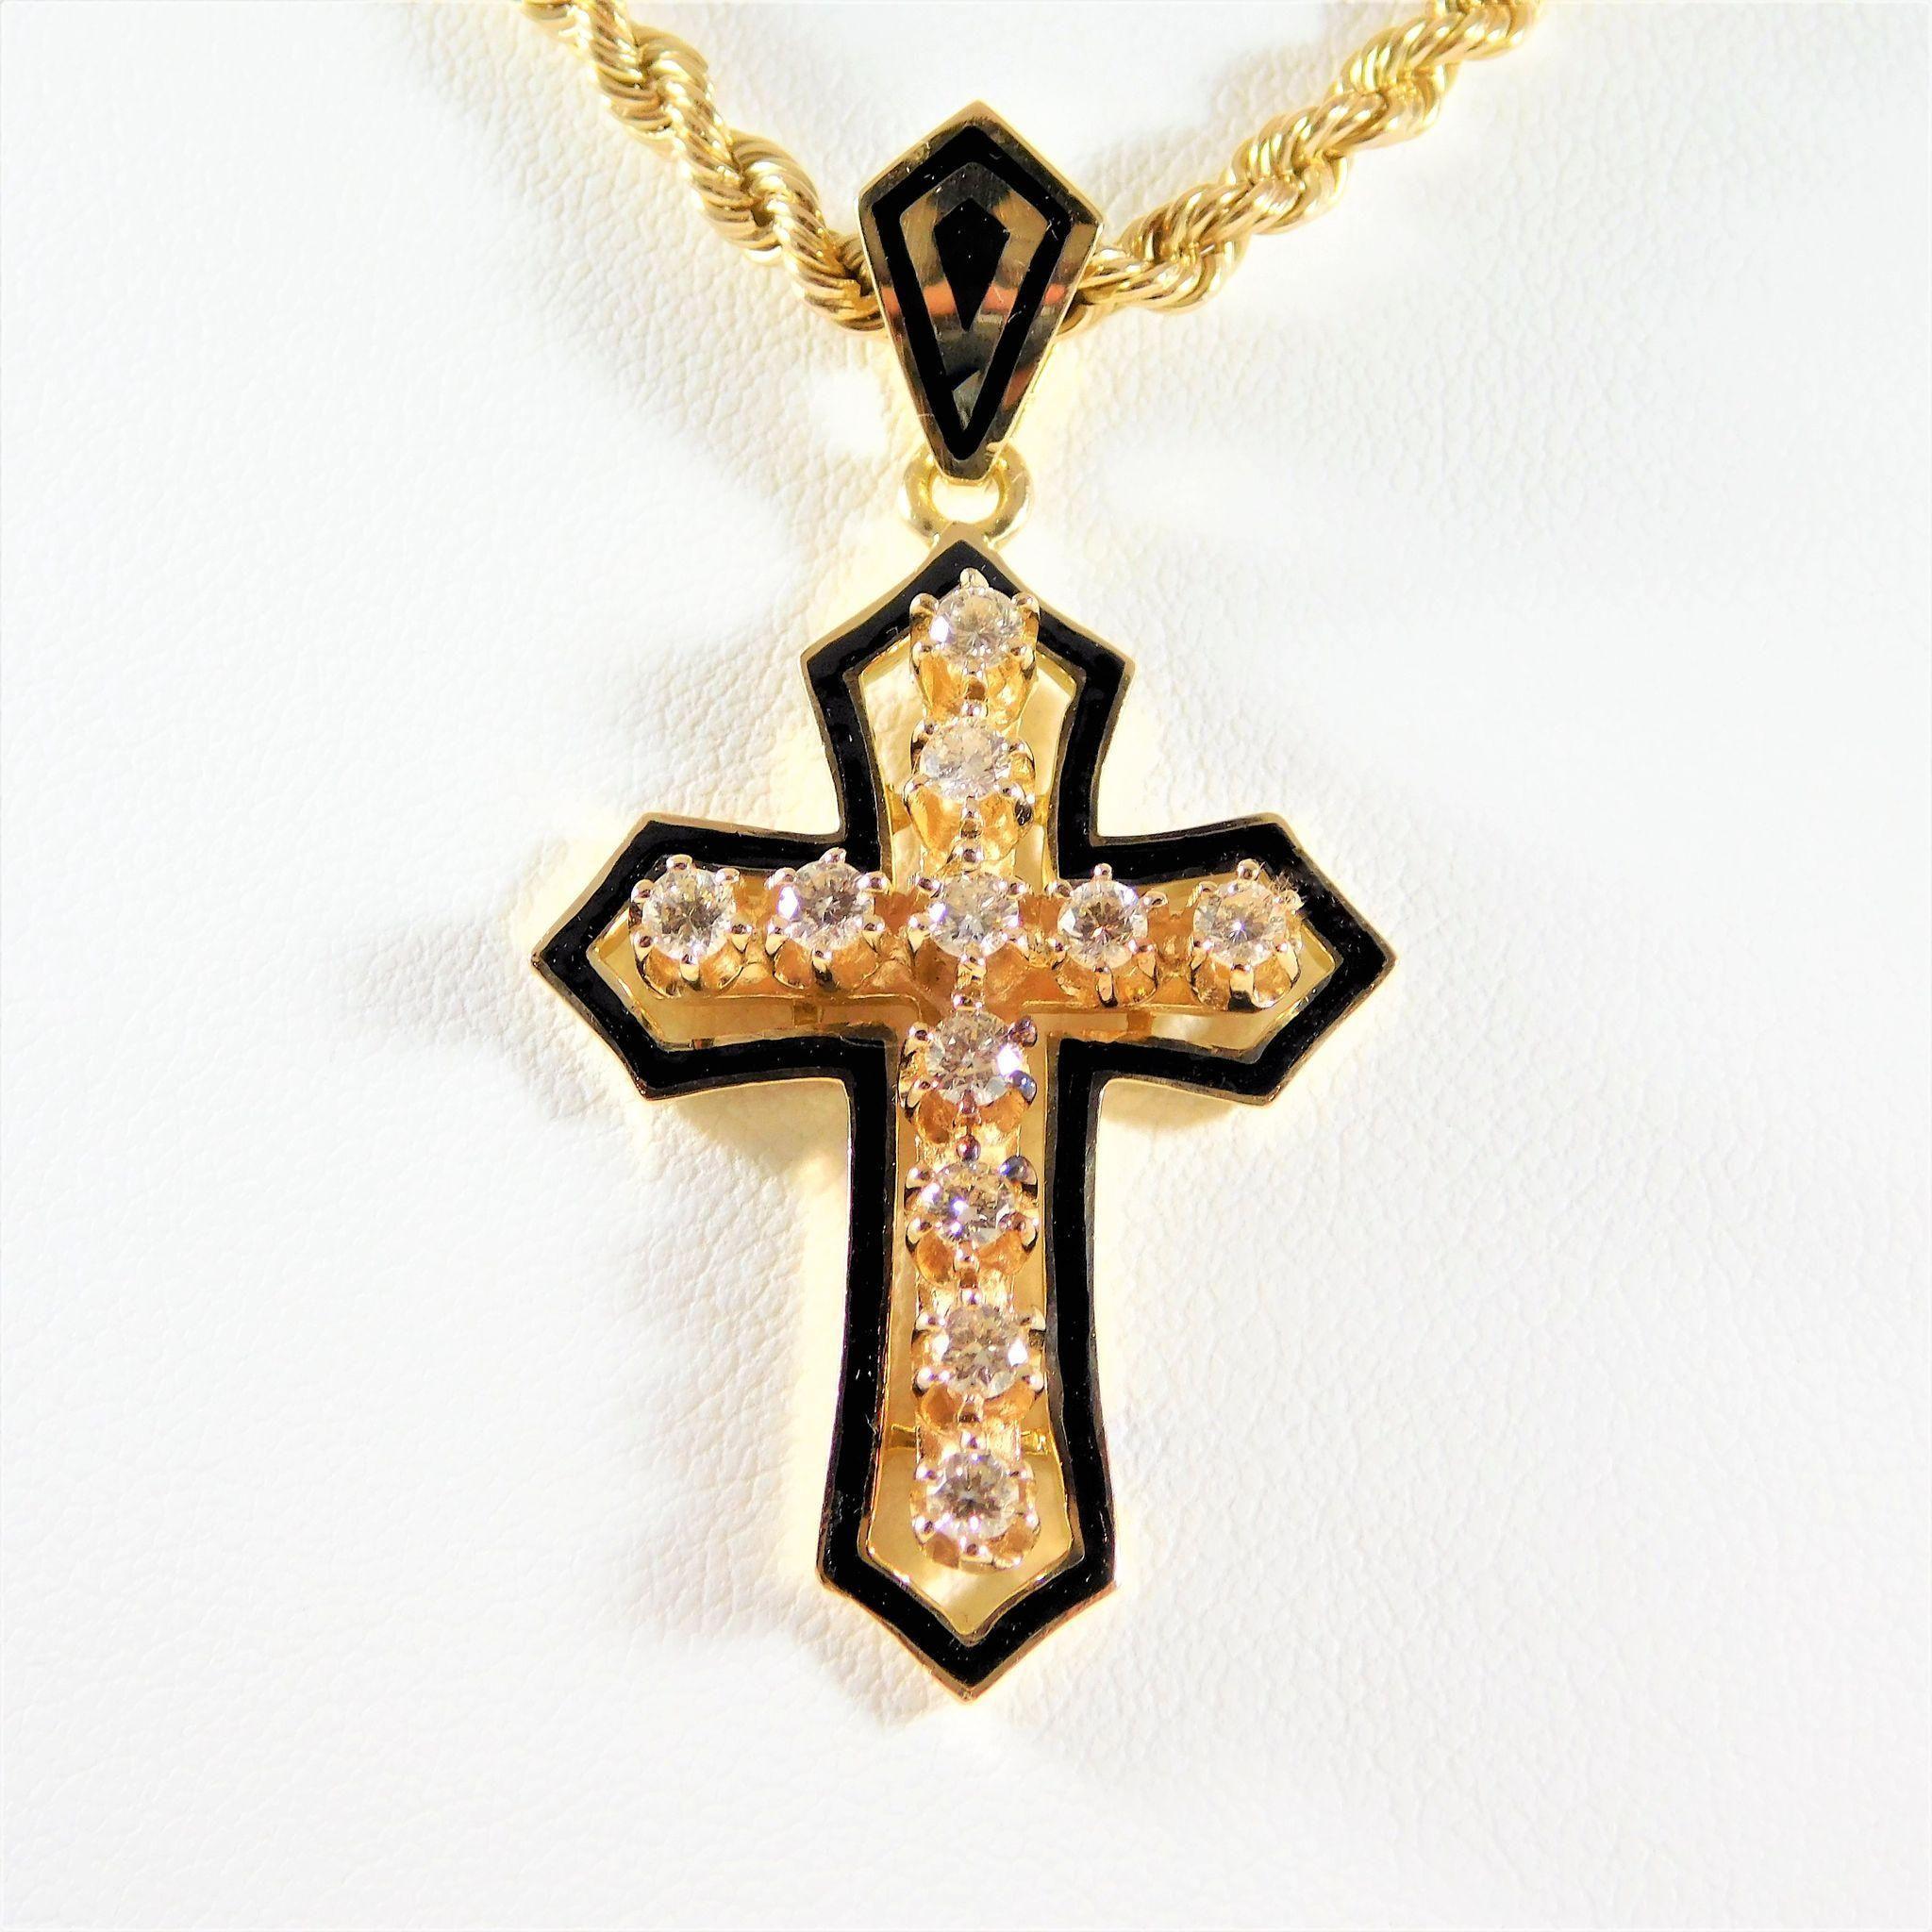 Vintage 14k gold black enamel and diamond gothic cross pendant vintage 14k gold black enamel and diamond gothic cross pendant audiocablefo